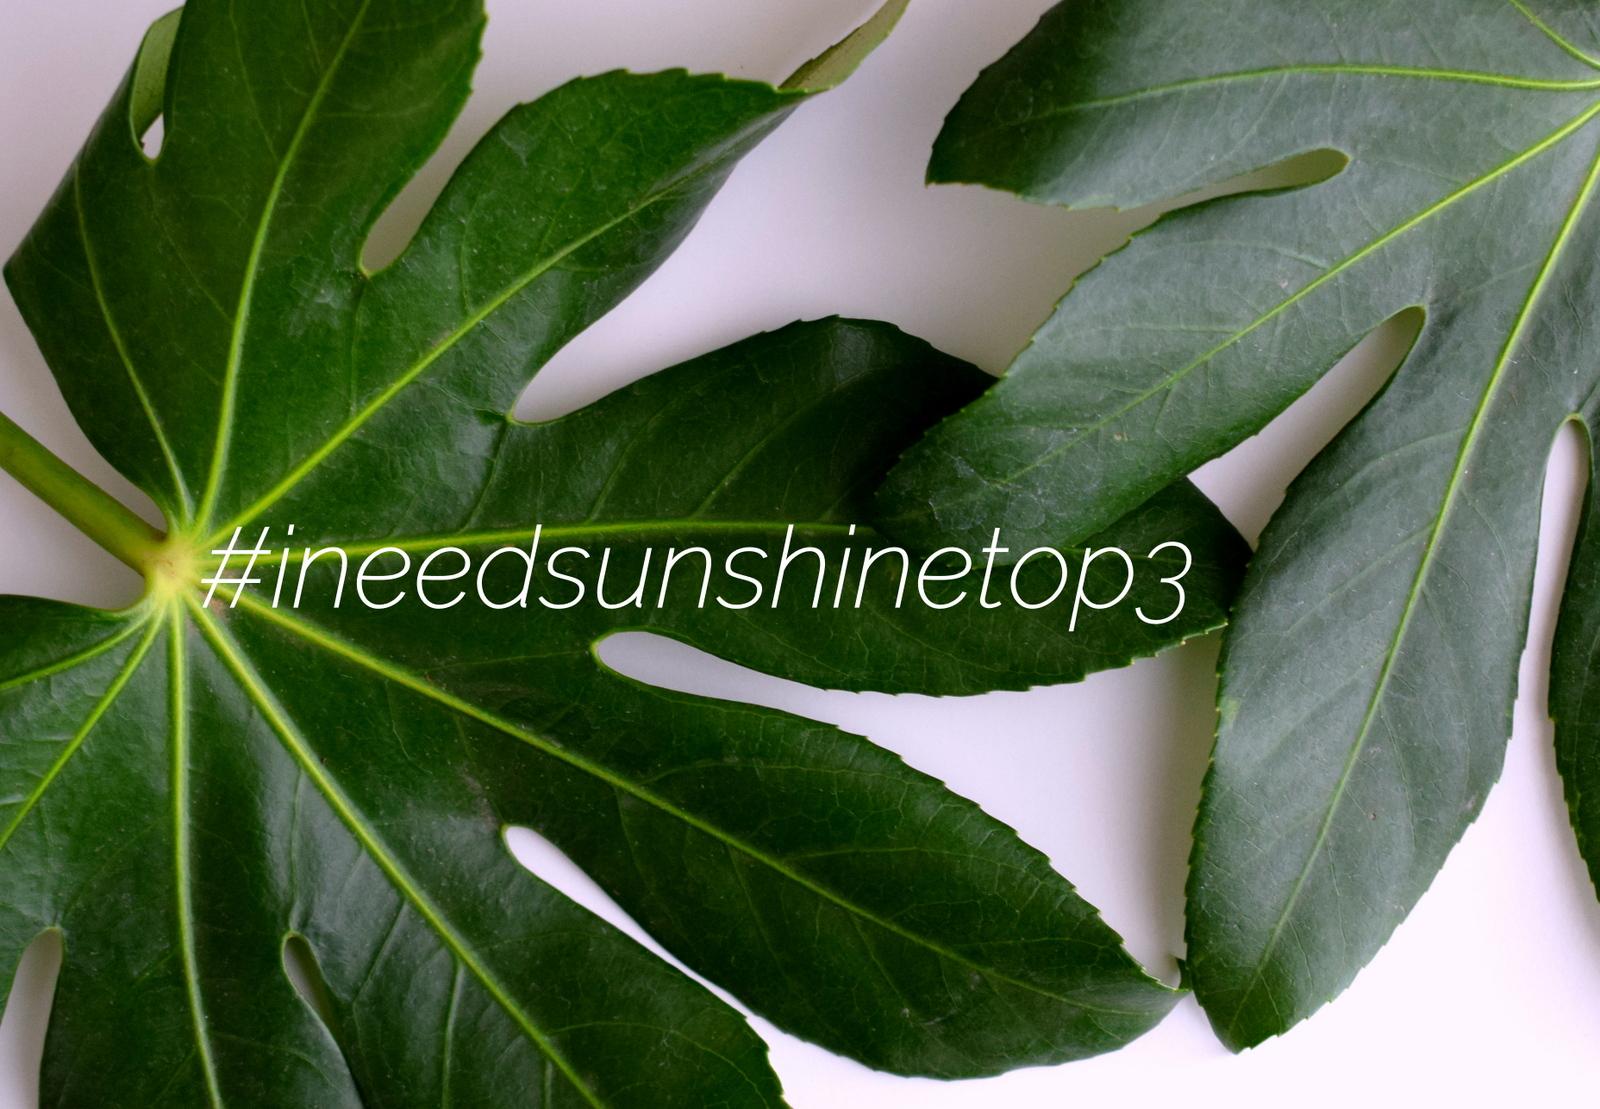 Beautyblog II need sunshine Top 3 Blogparade zieht um zu Instagram mit dem Hashtag #ineedsunshinetop3.